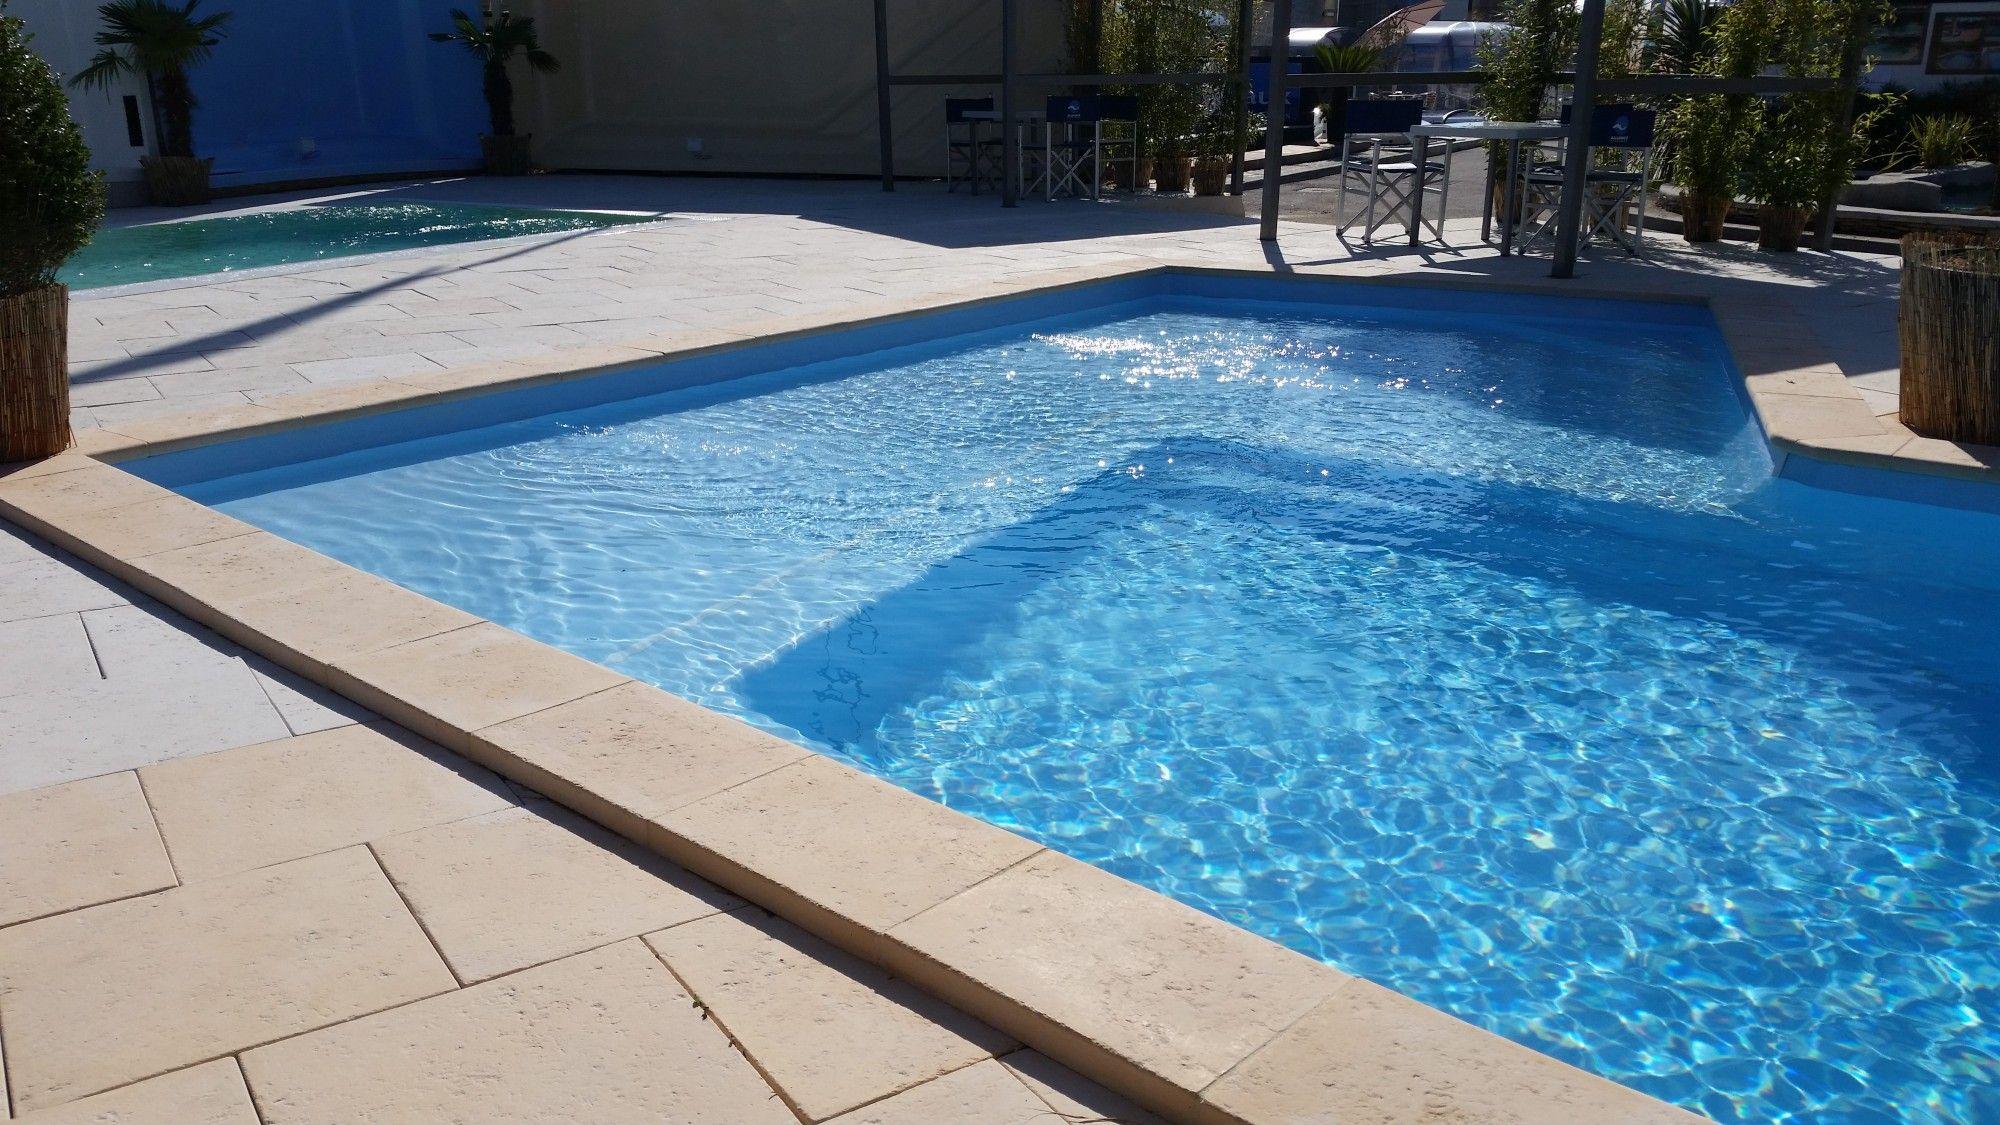 plage piscine une plage de piscine immerge with plage piscine simple carrelage terrasse. Black Bedroom Furniture Sets. Home Design Ideas